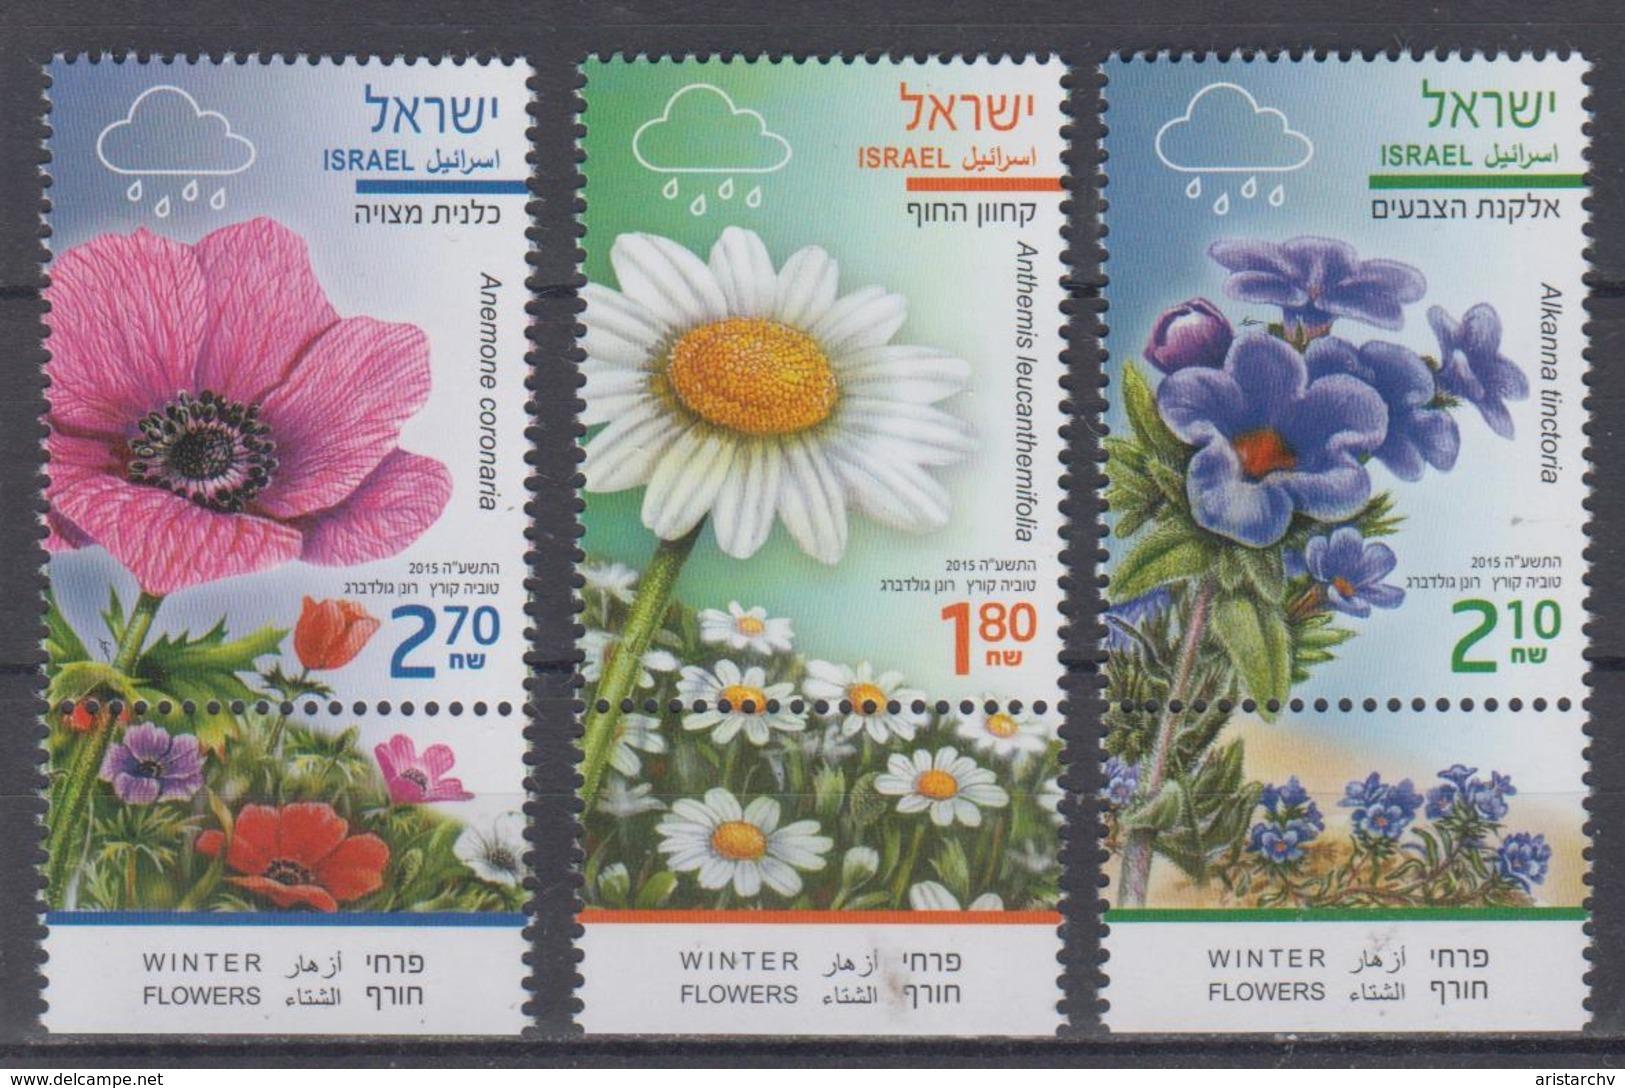 ISRAEL 2015 WINTER FLOWER ANEMONE ANTHEMIS ALKANNA - Israel